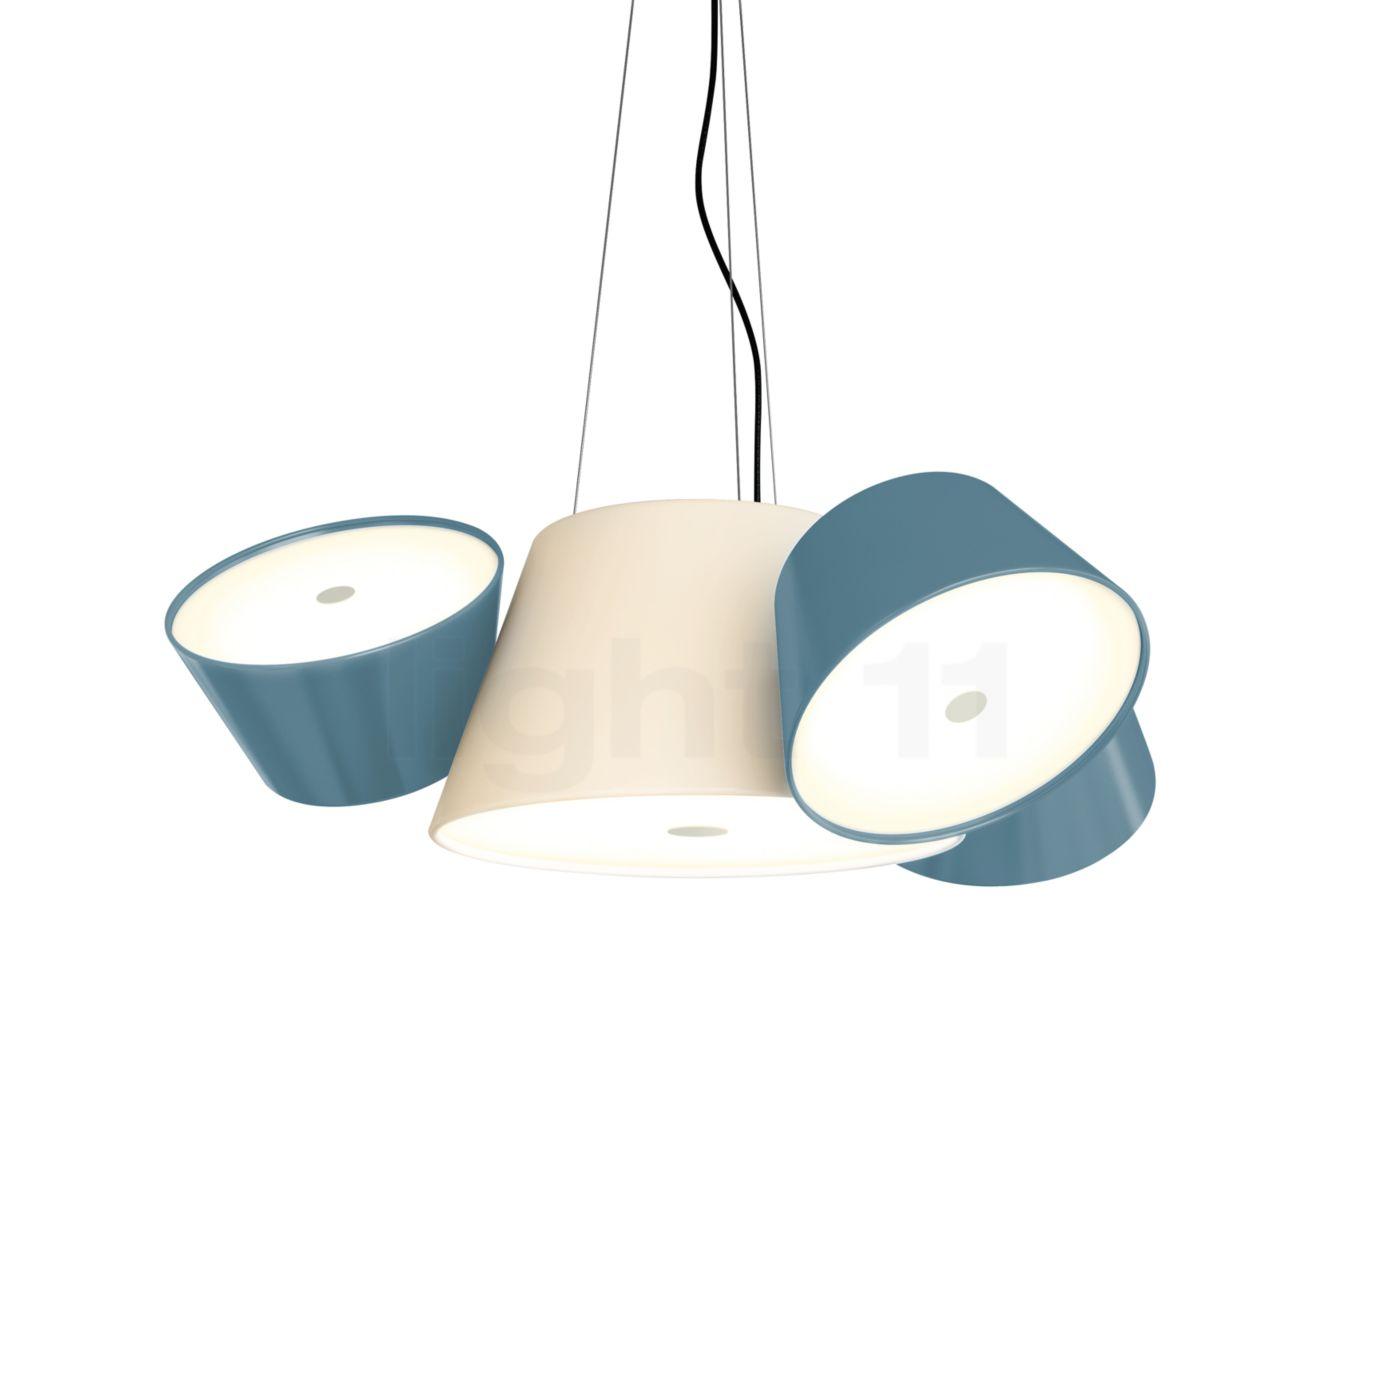 Marset Tam Tam Mini, gebrochenes weiß/blau A633-012 35 + 3xA633-011 48